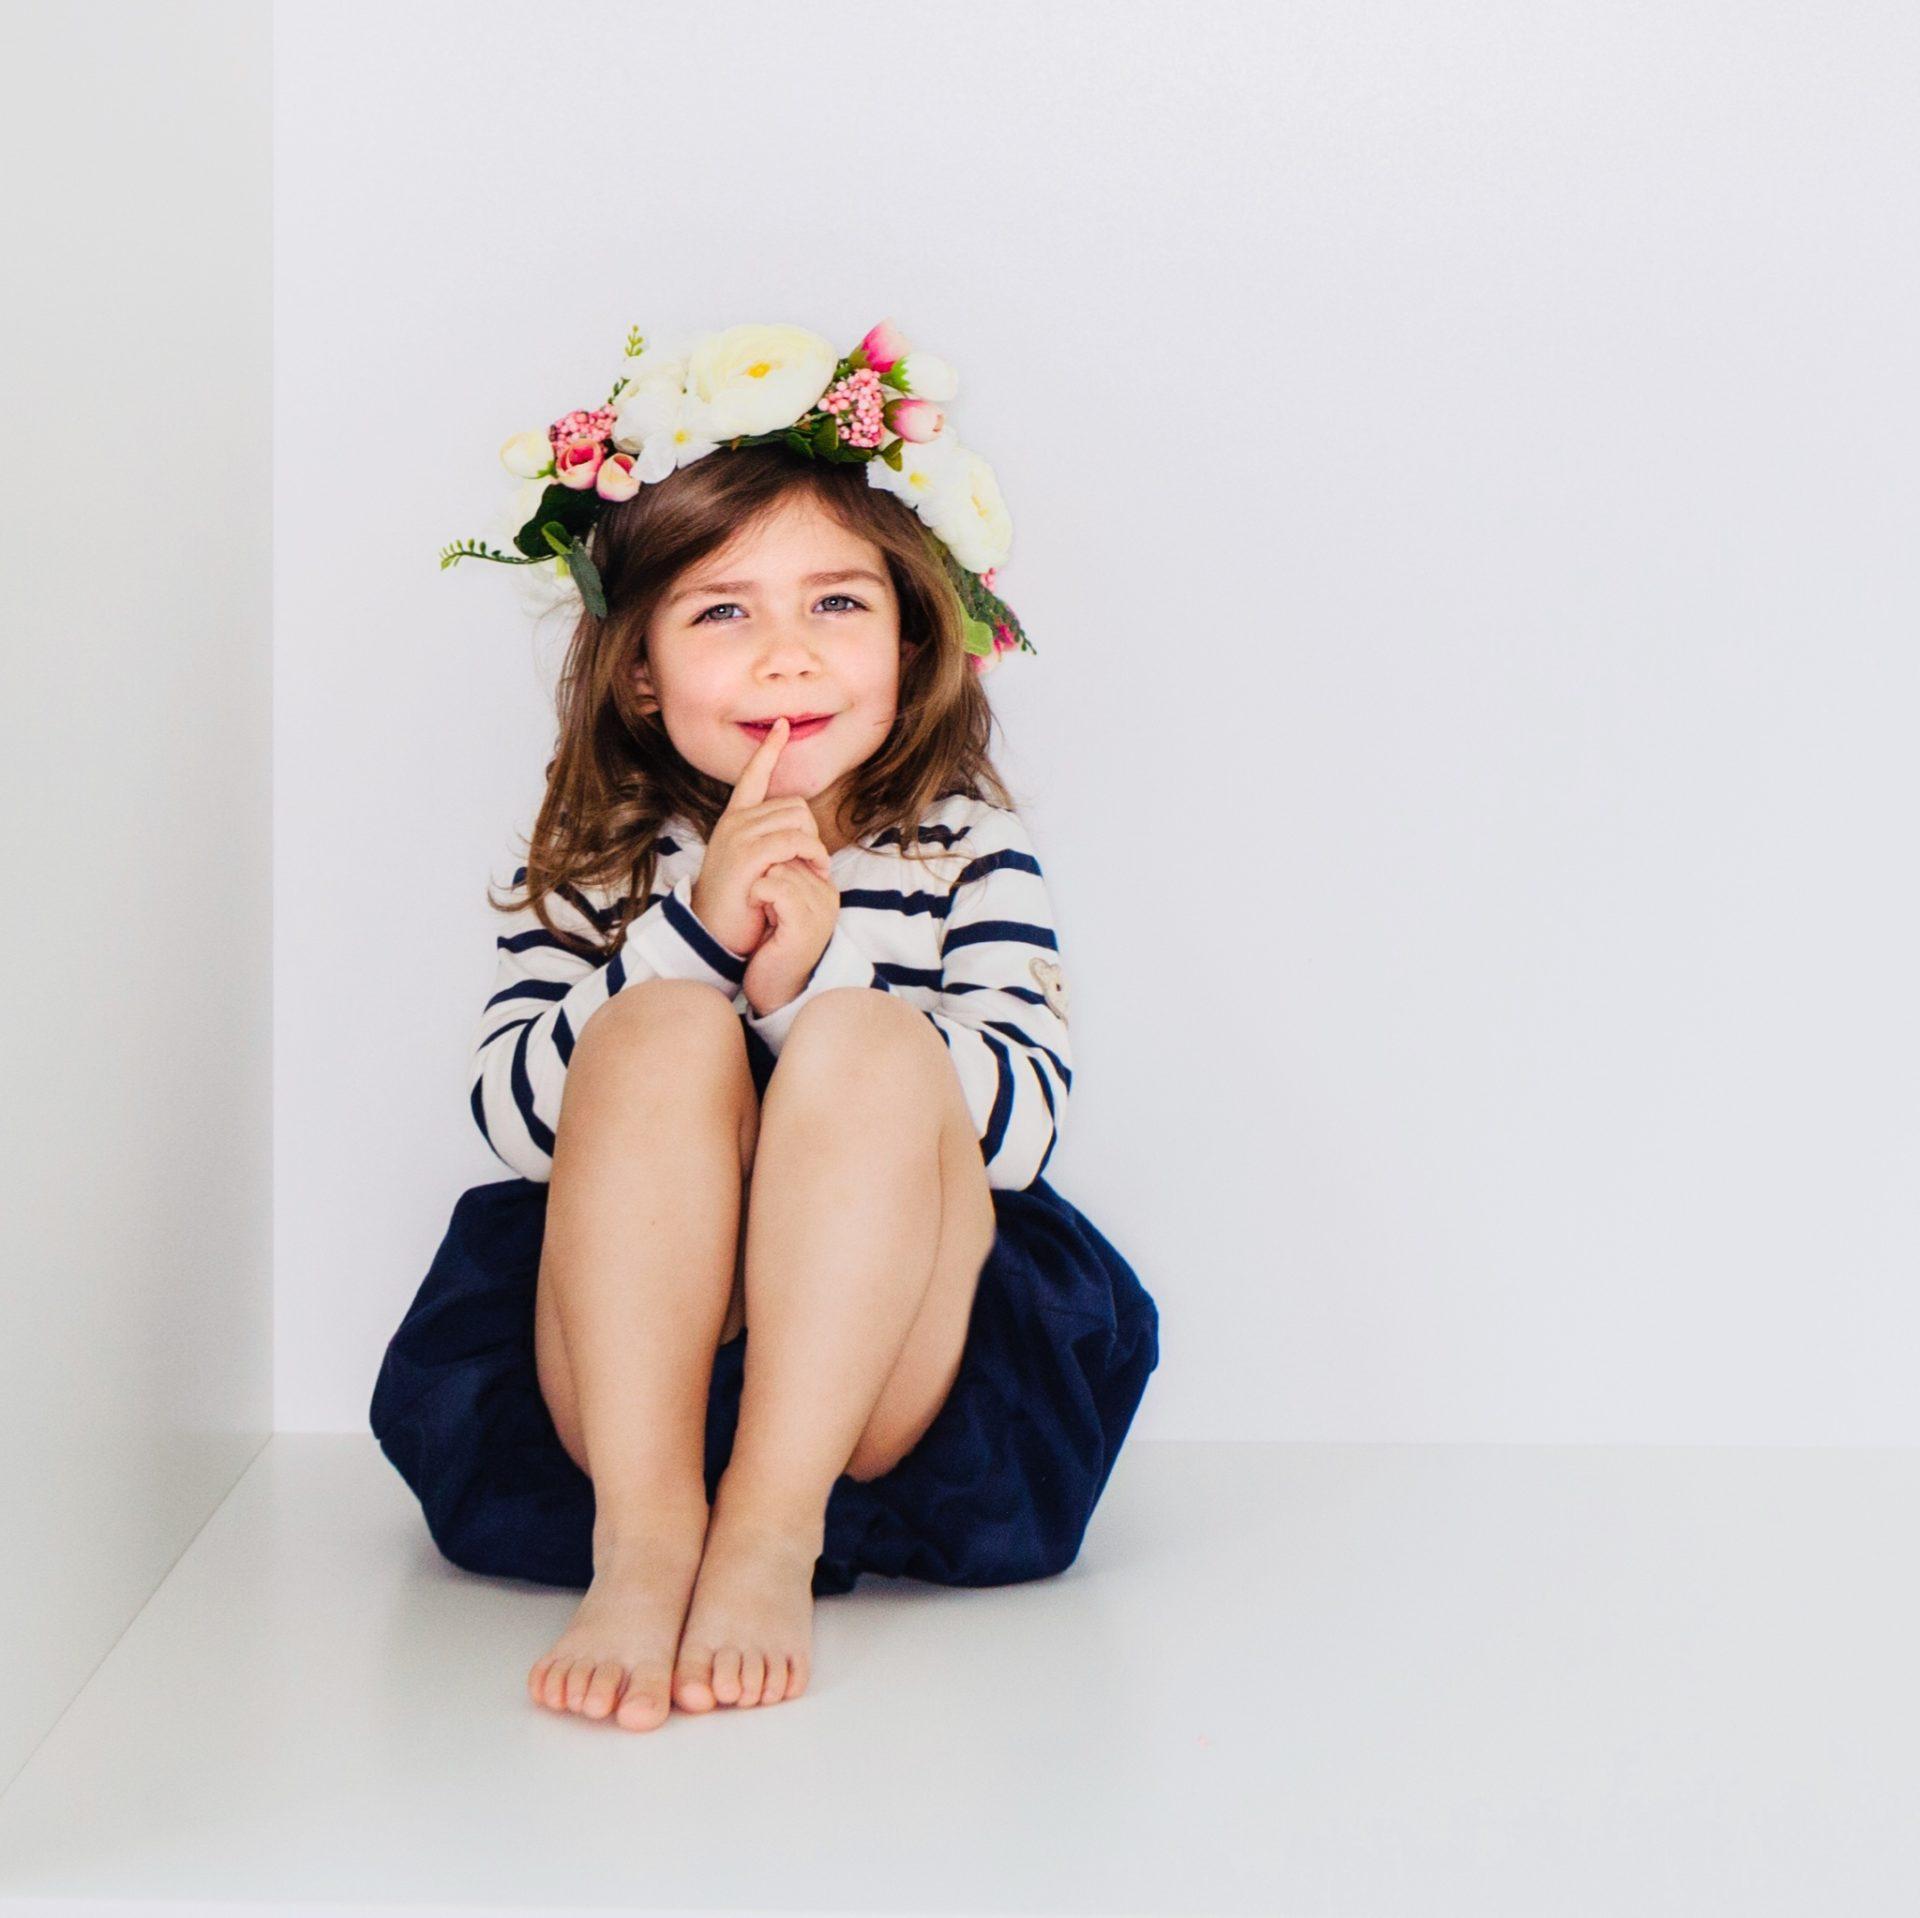 galerie-littleboxes-01-kindergartenfotografie